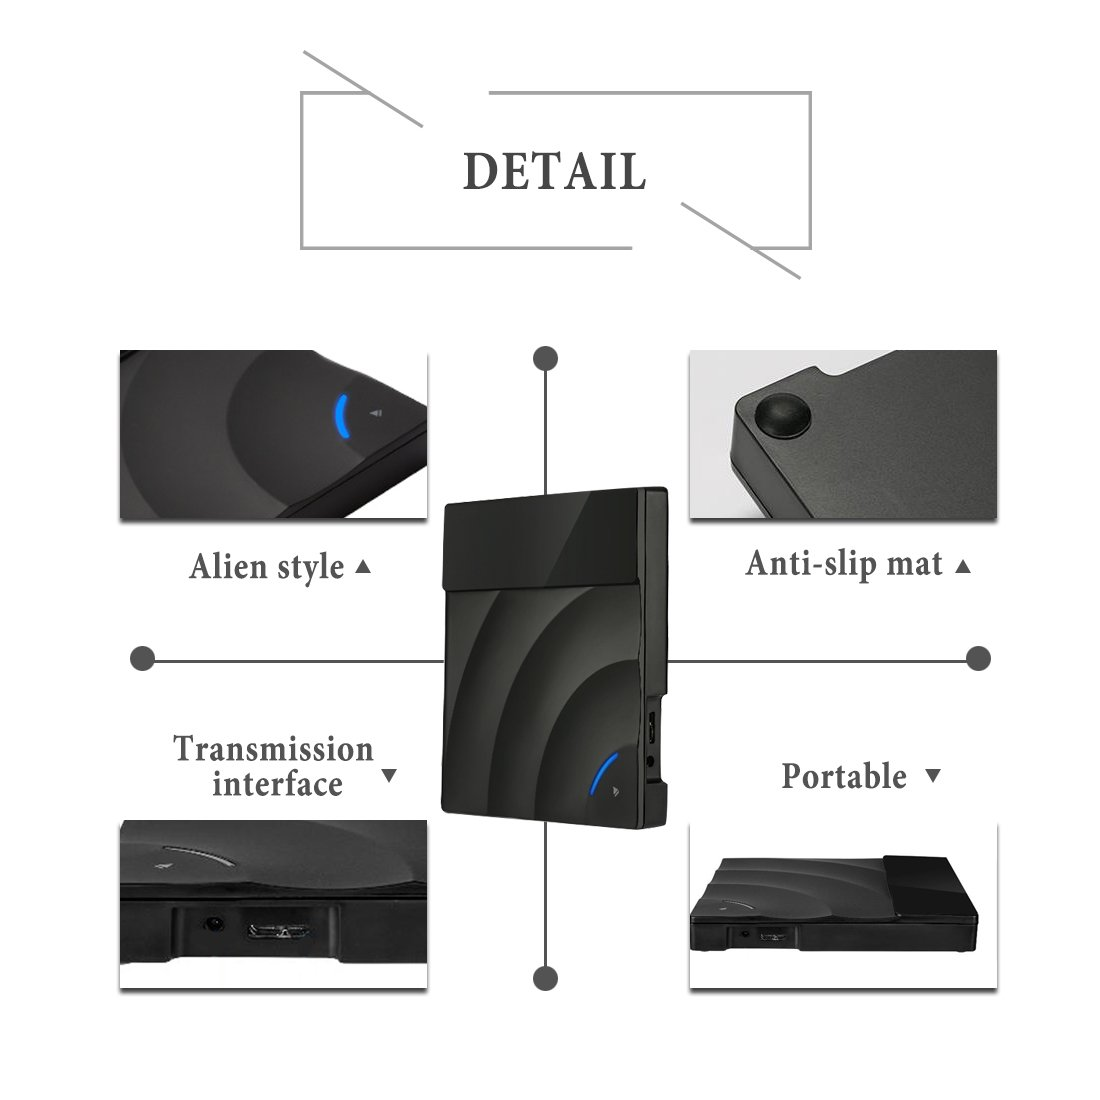 External DVD Drive, Sunreal USB 3.0 External CD DVD Burner Ultra Slim Portable Touch Control CD/DVD Writer Reader Player for Laptop/Desktop Support Window/Mac OS(Black) by Sunreal (Image #6)